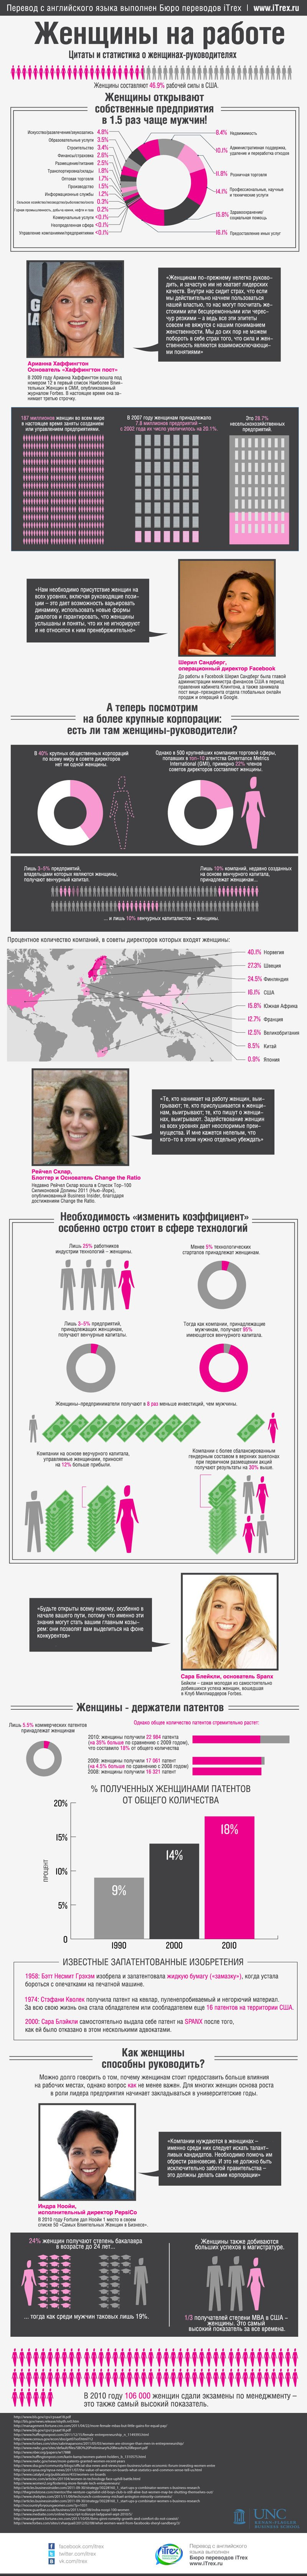 perevod na russkiy women at work